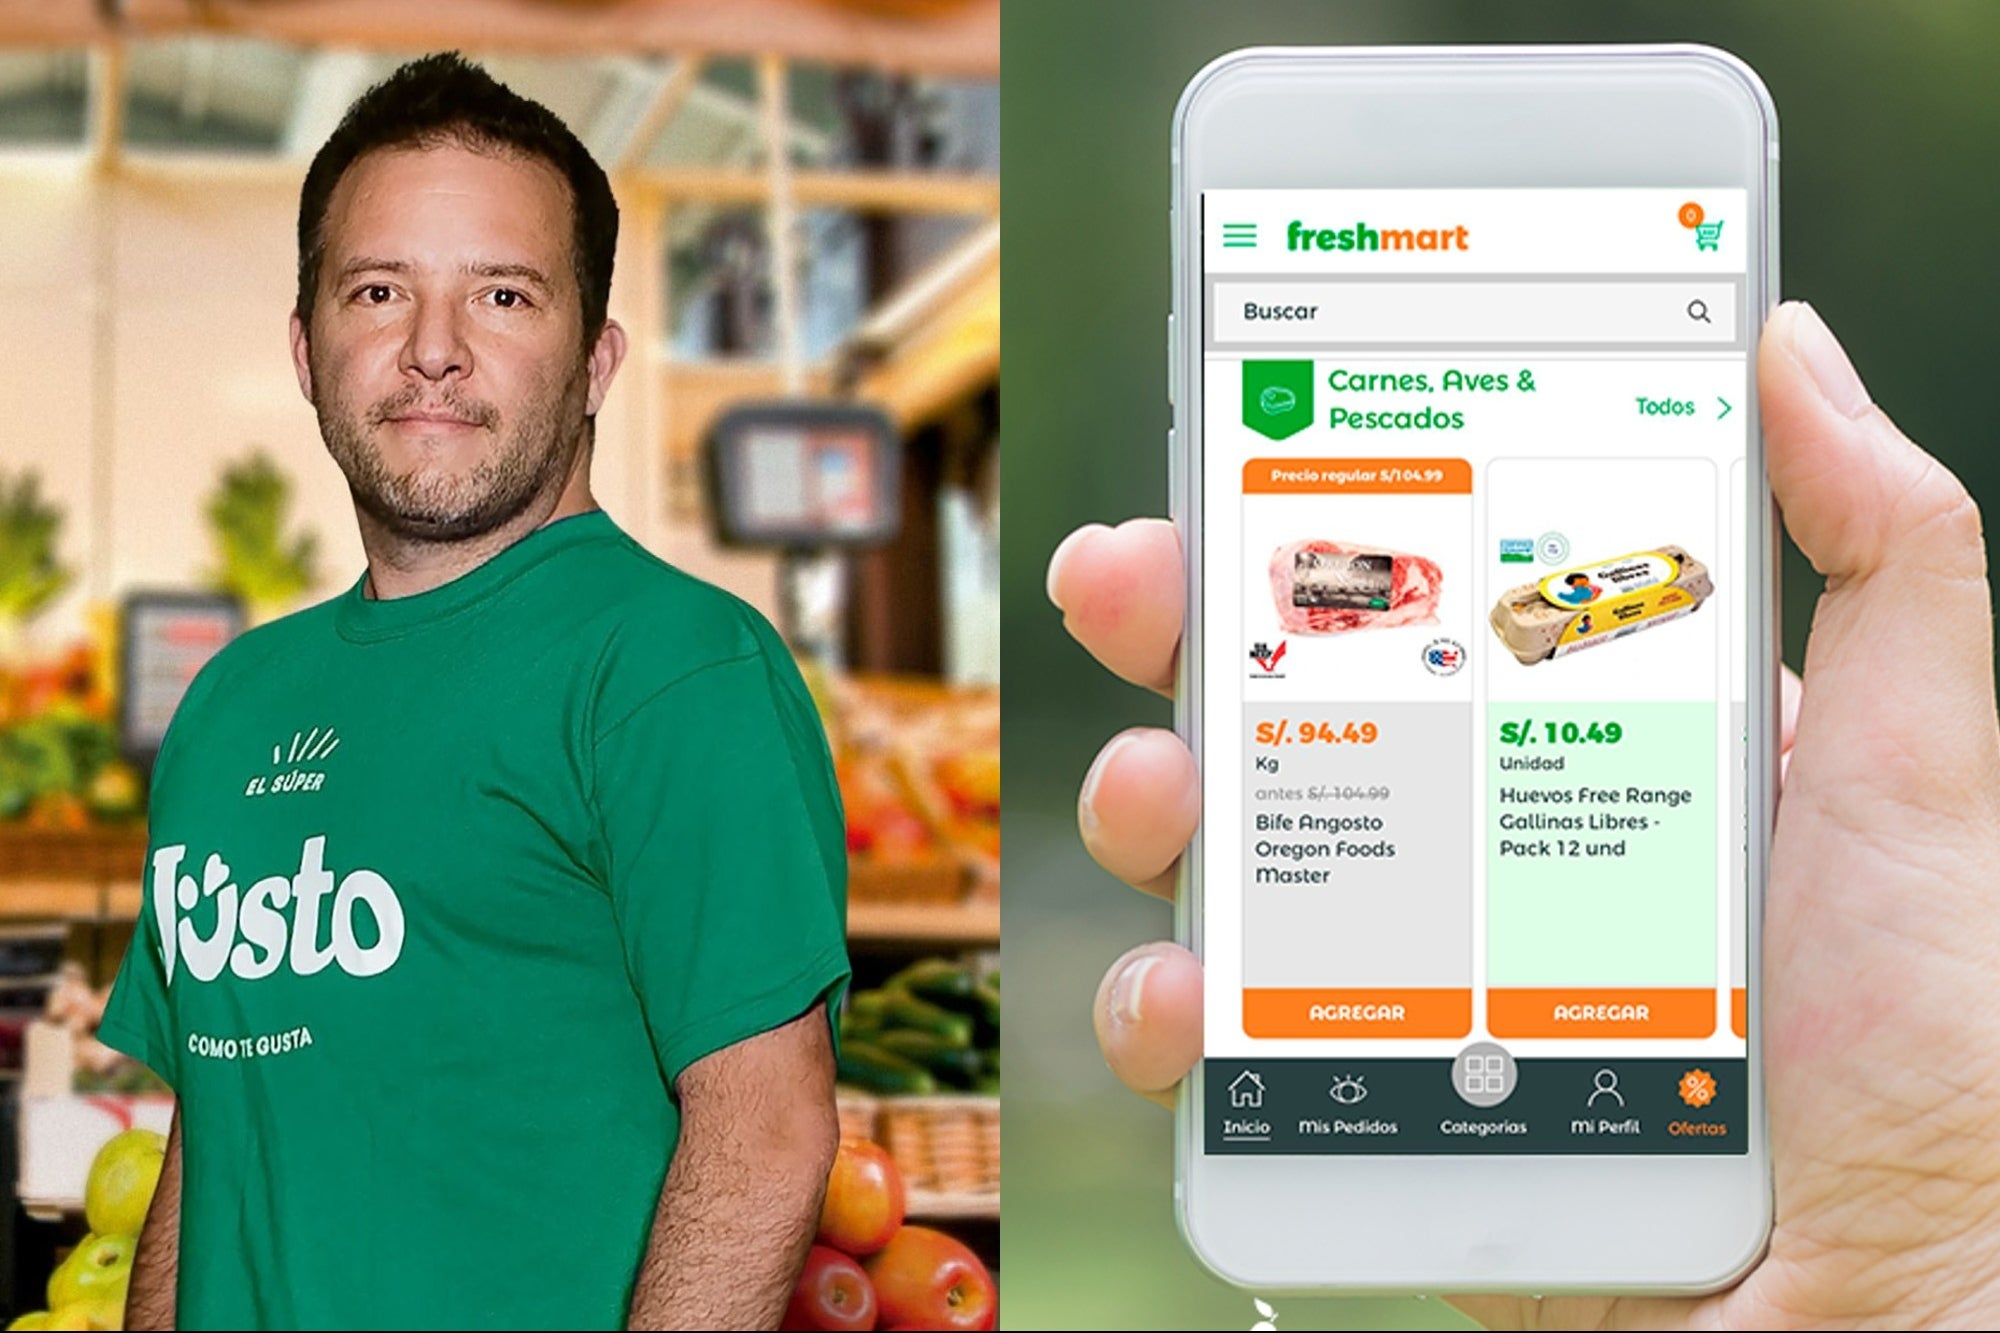 Mexican Jüsto buys startup Freshmart to expand to Peru